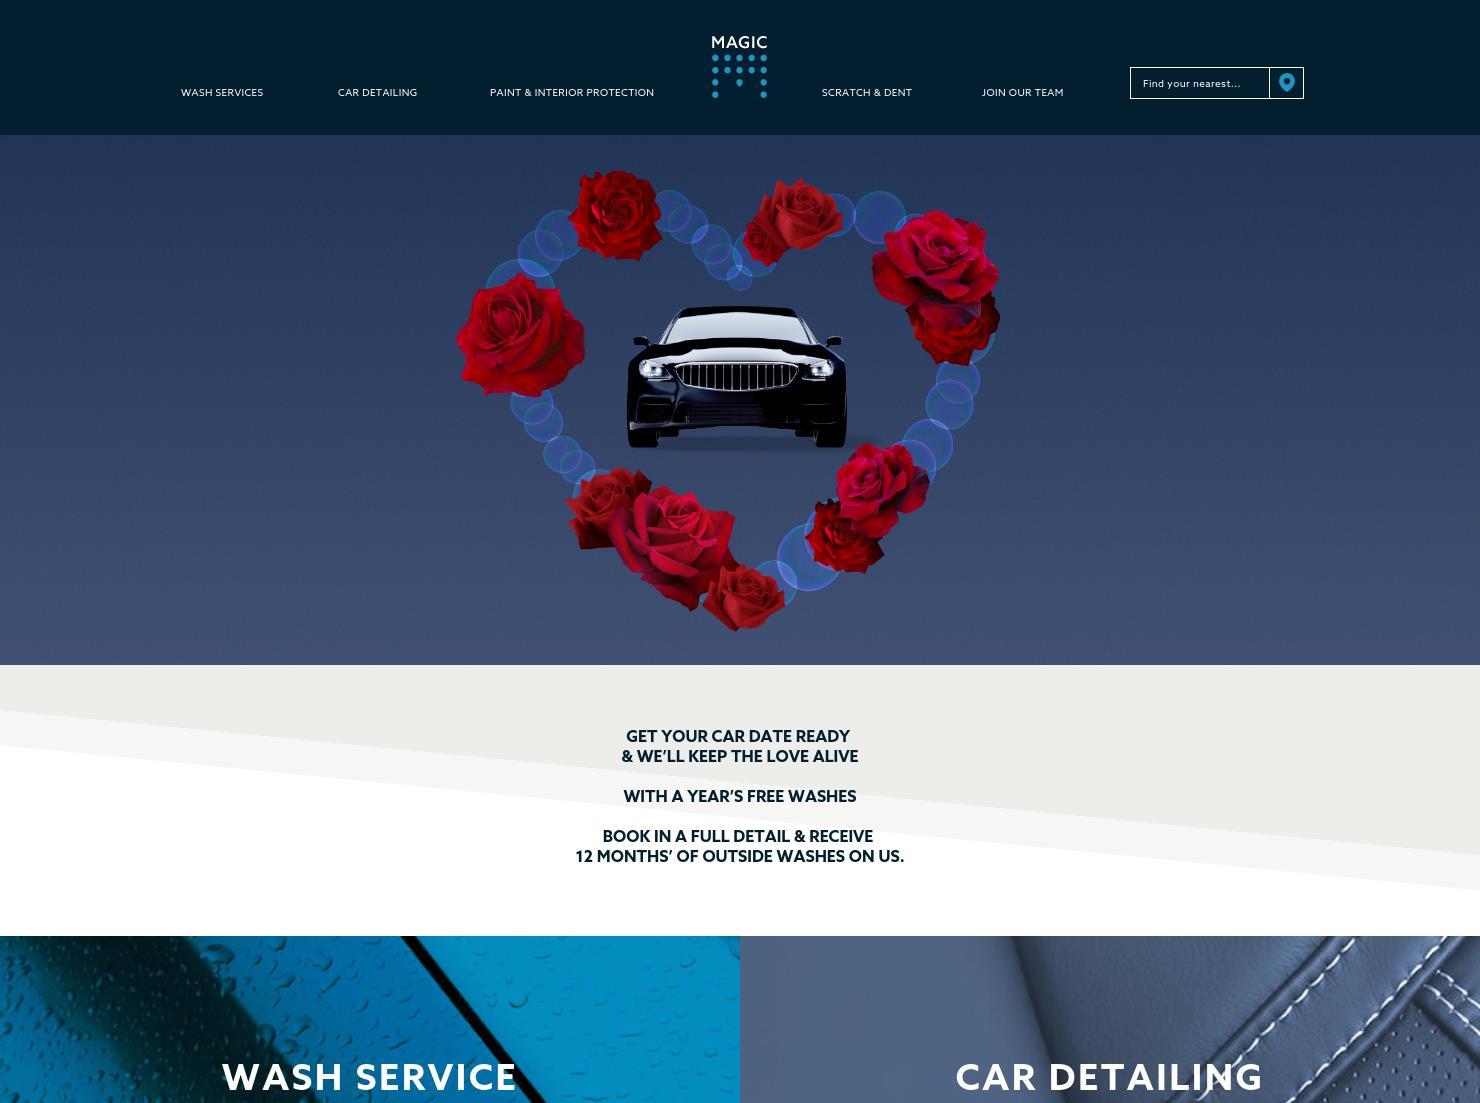 Mhcw collingwood collingwood vic merchant details website magic hand car wash solutioingenieria Gallery